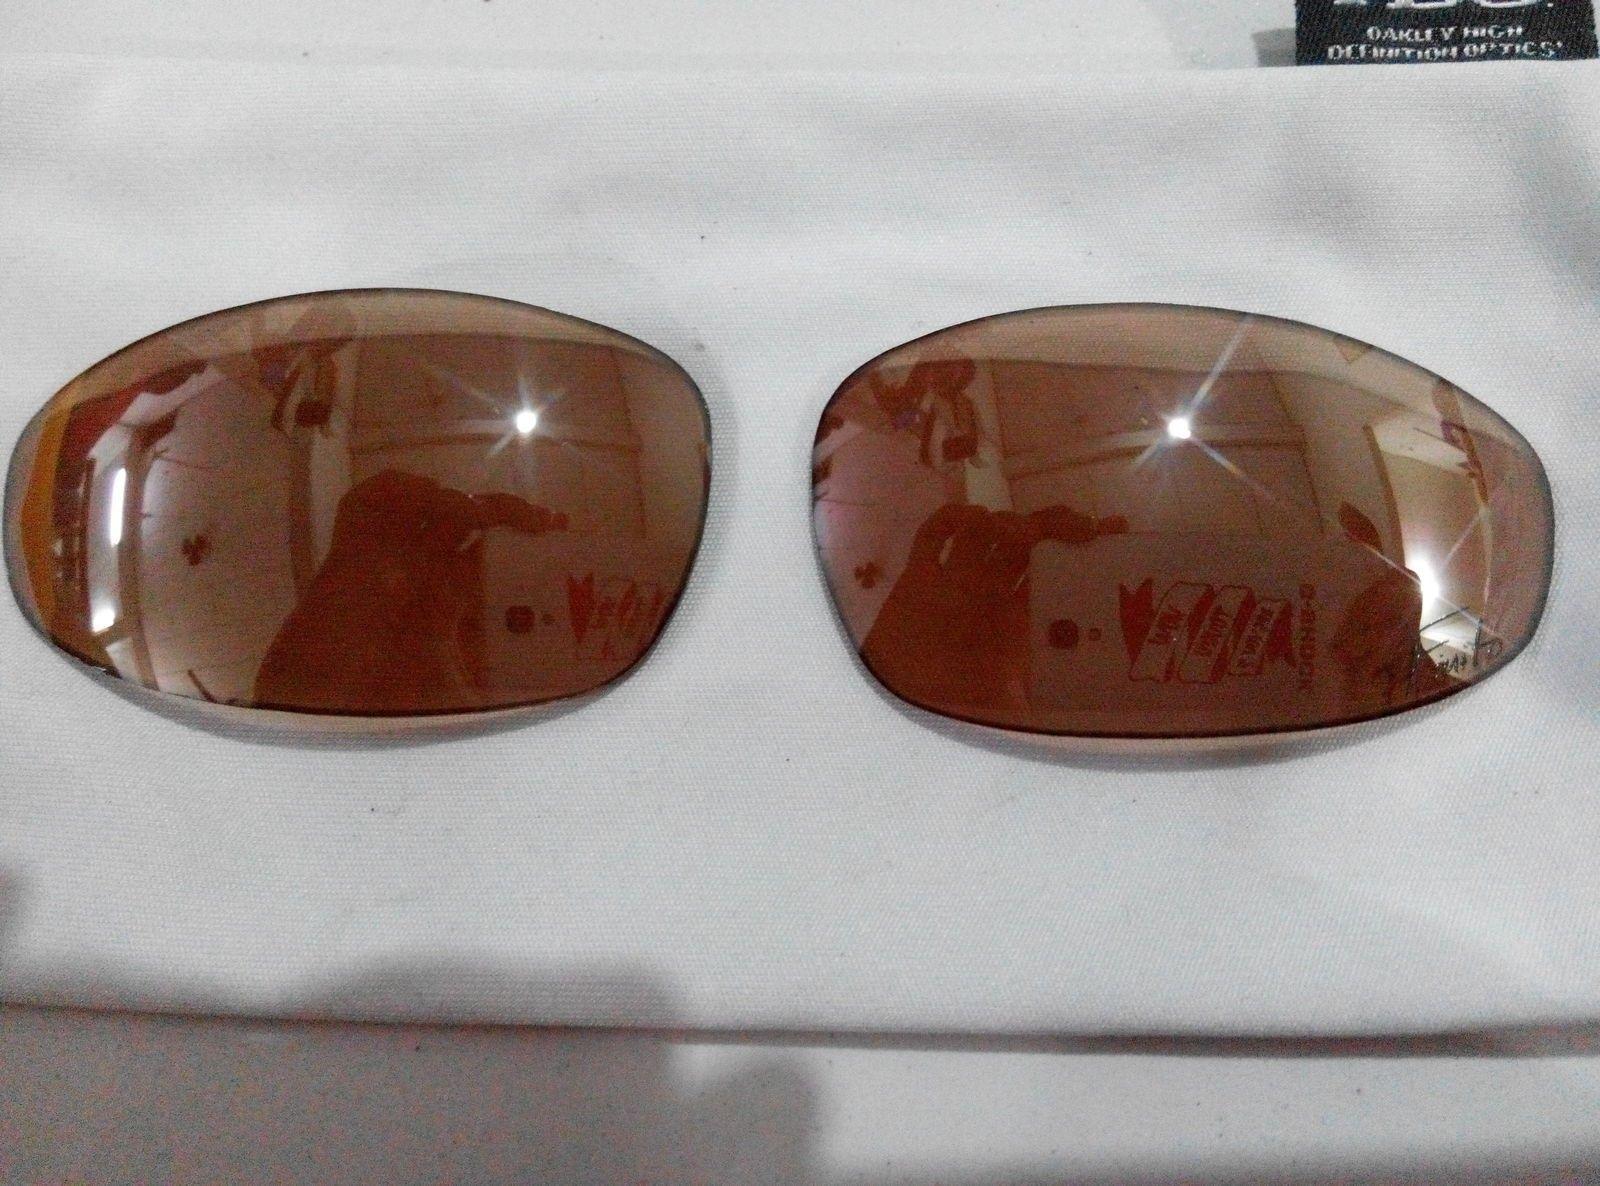 Finito vr50 iridium lens - IMG_20150728_195130.jpg